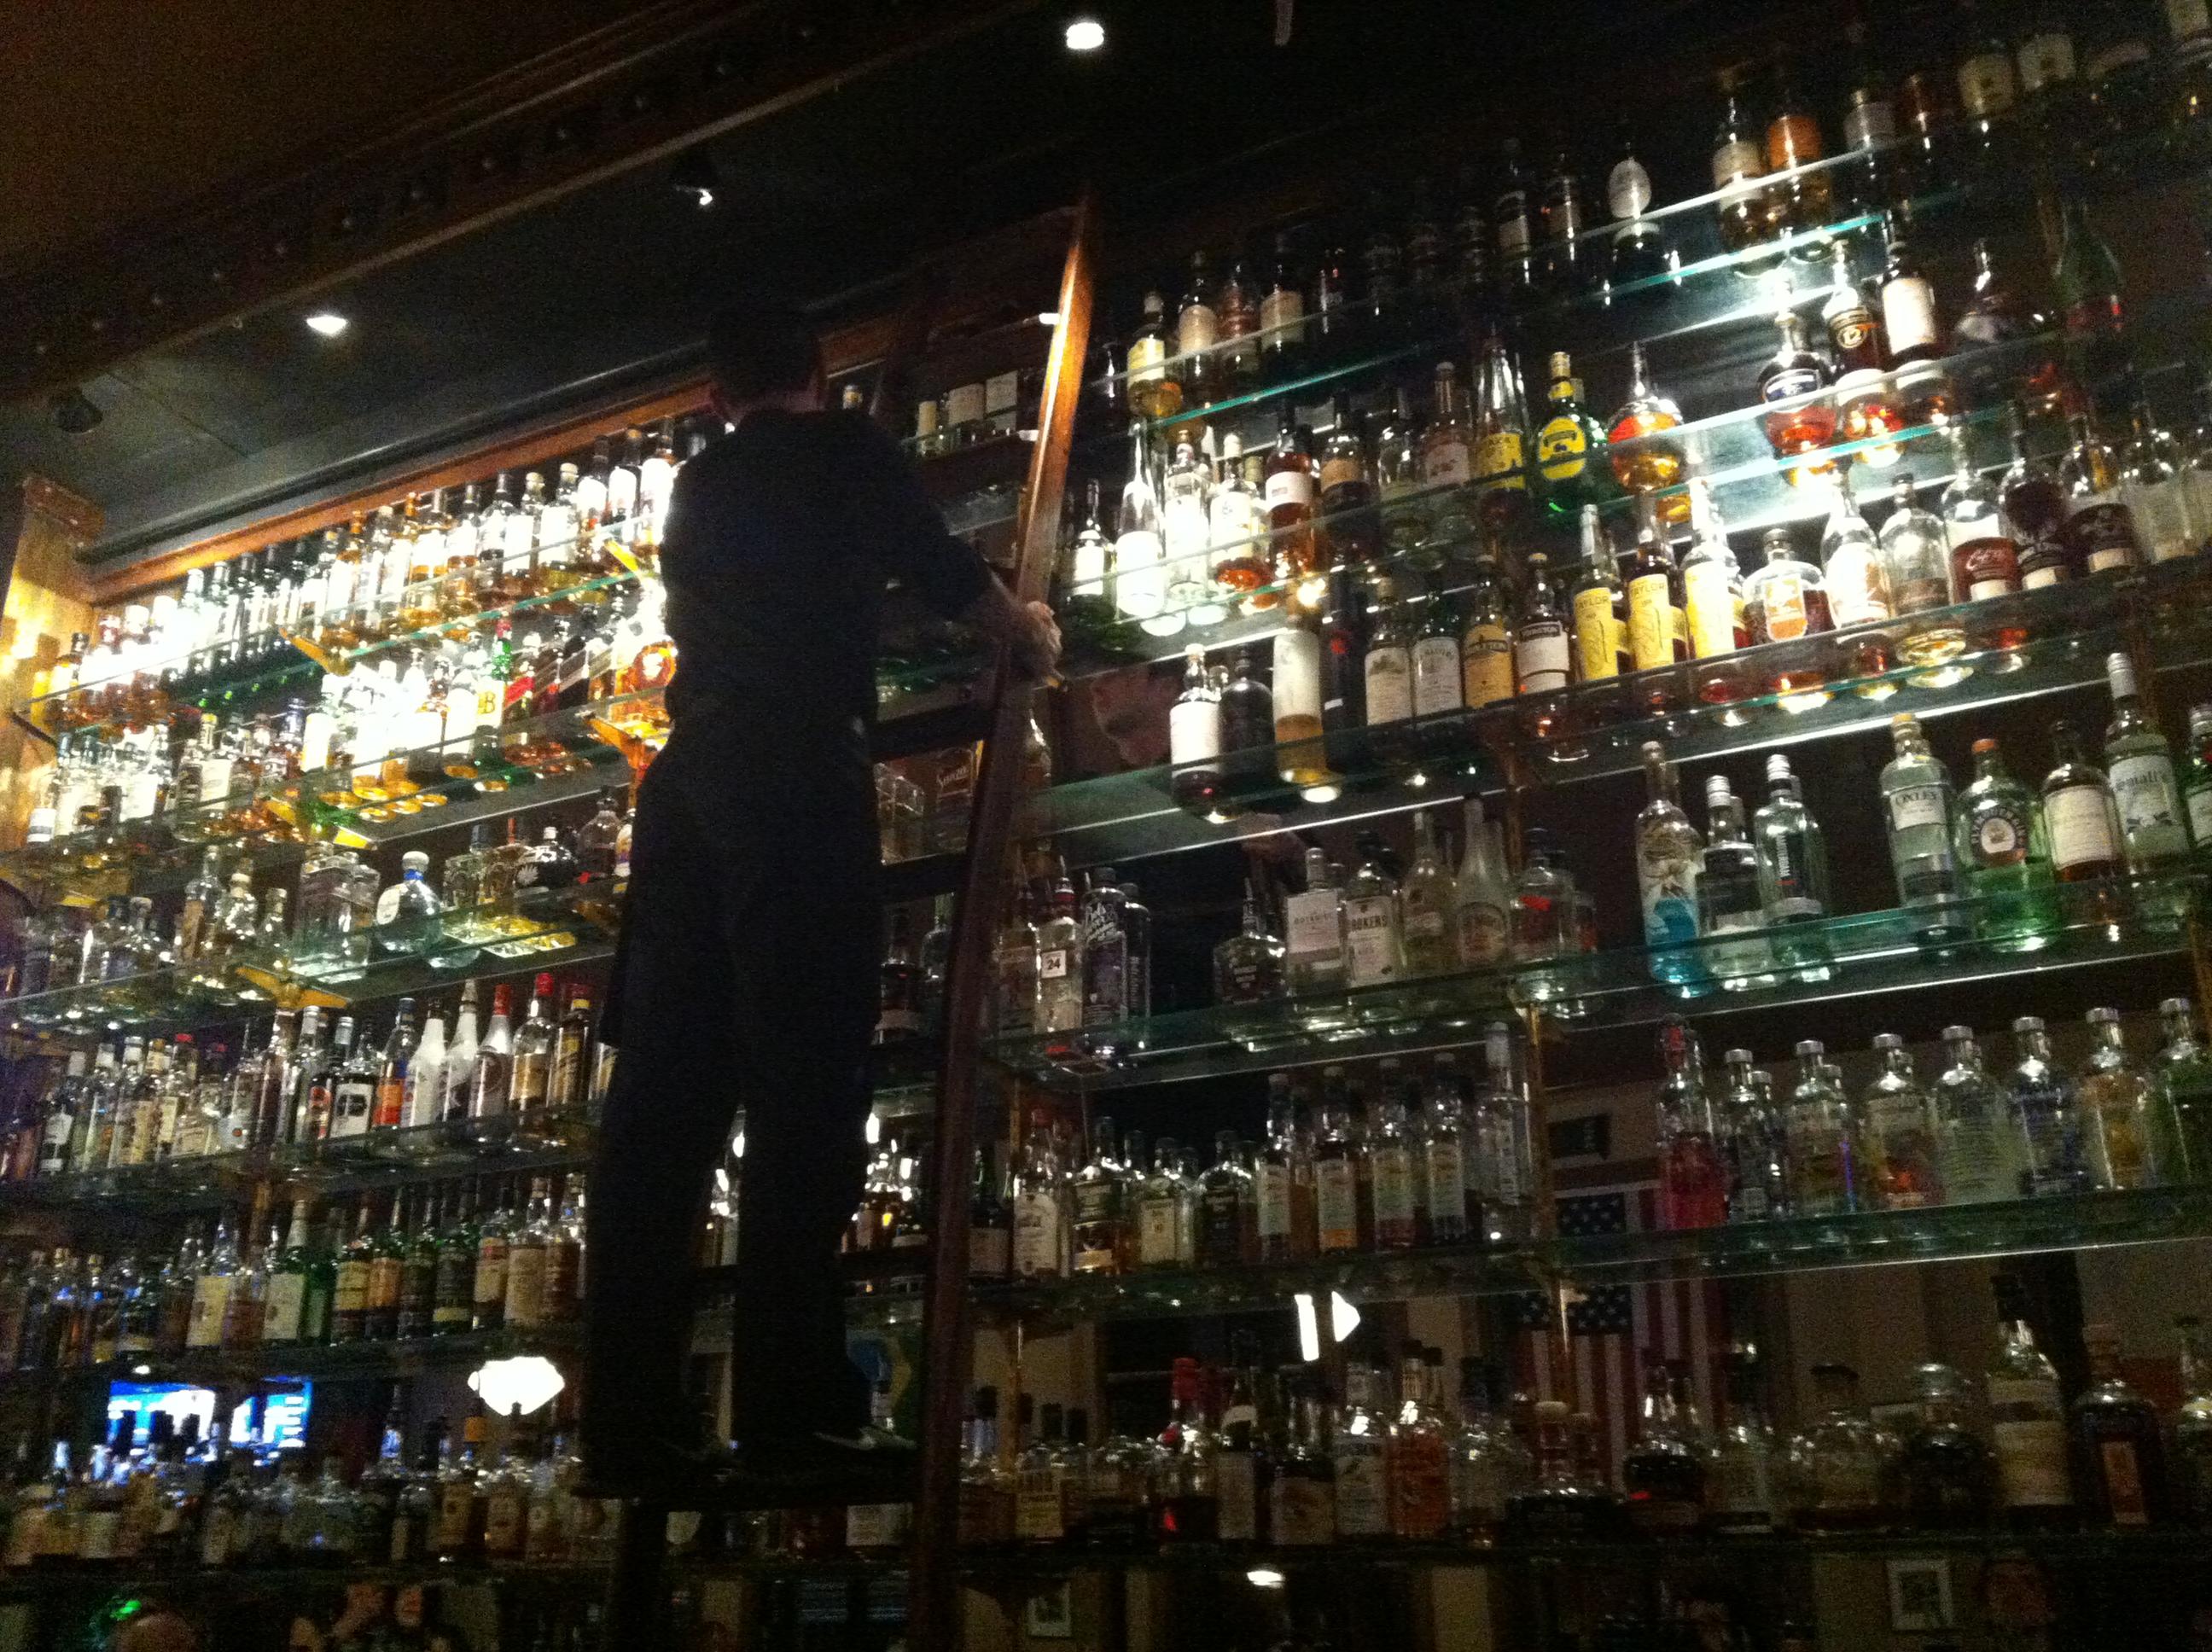 Wall o' Booze